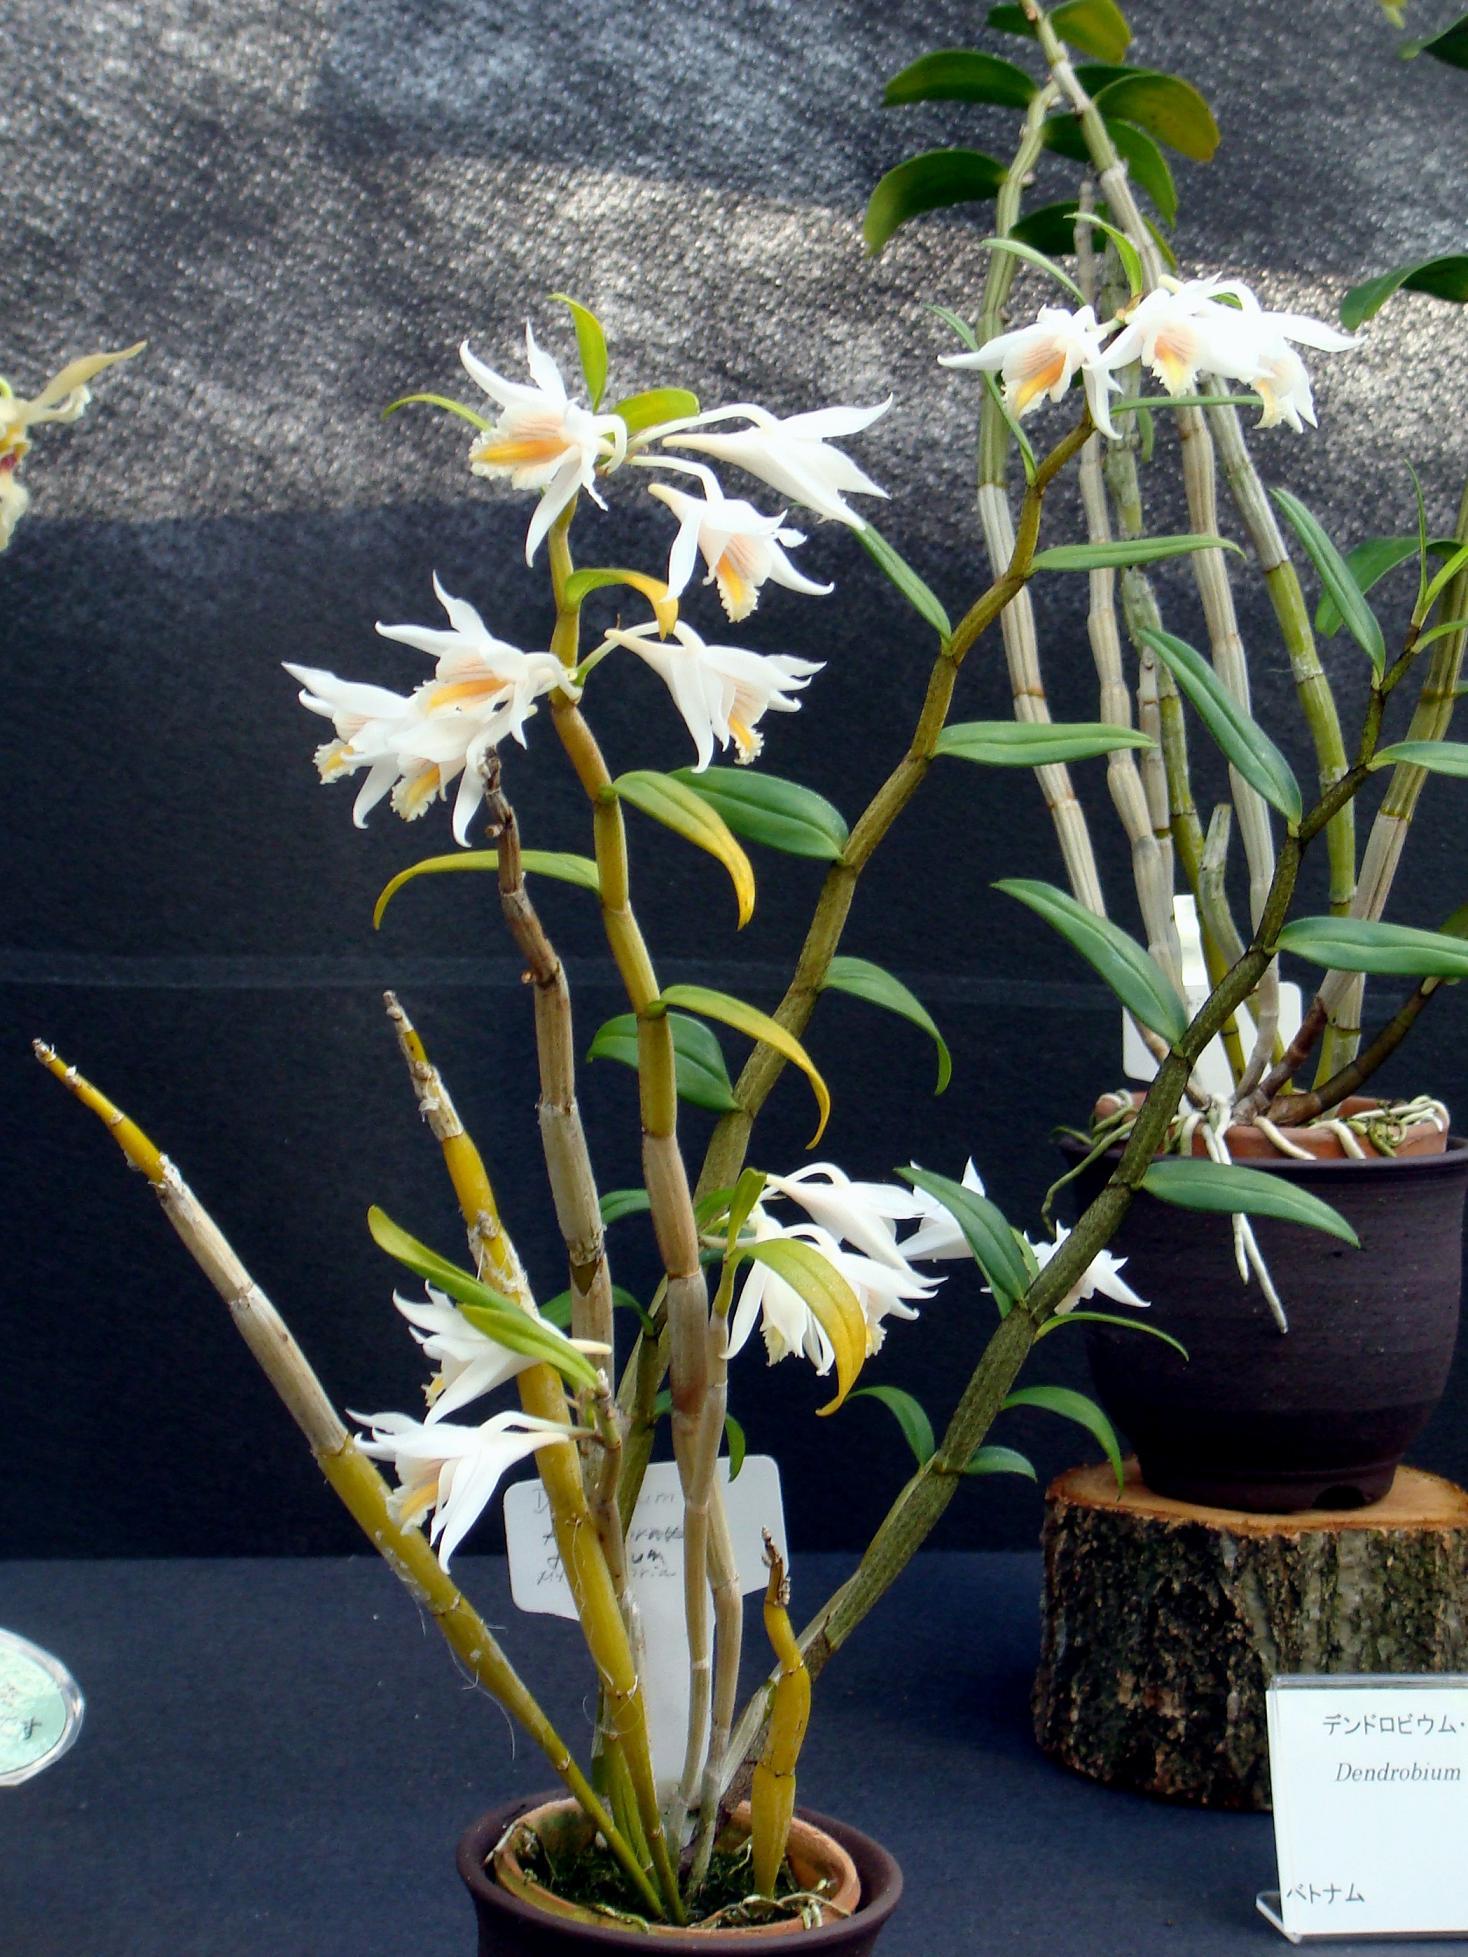 http://orchids.la.coocan.jp/Dendrobium/Dendrobium%20flexuosum/DSC02790.JPG